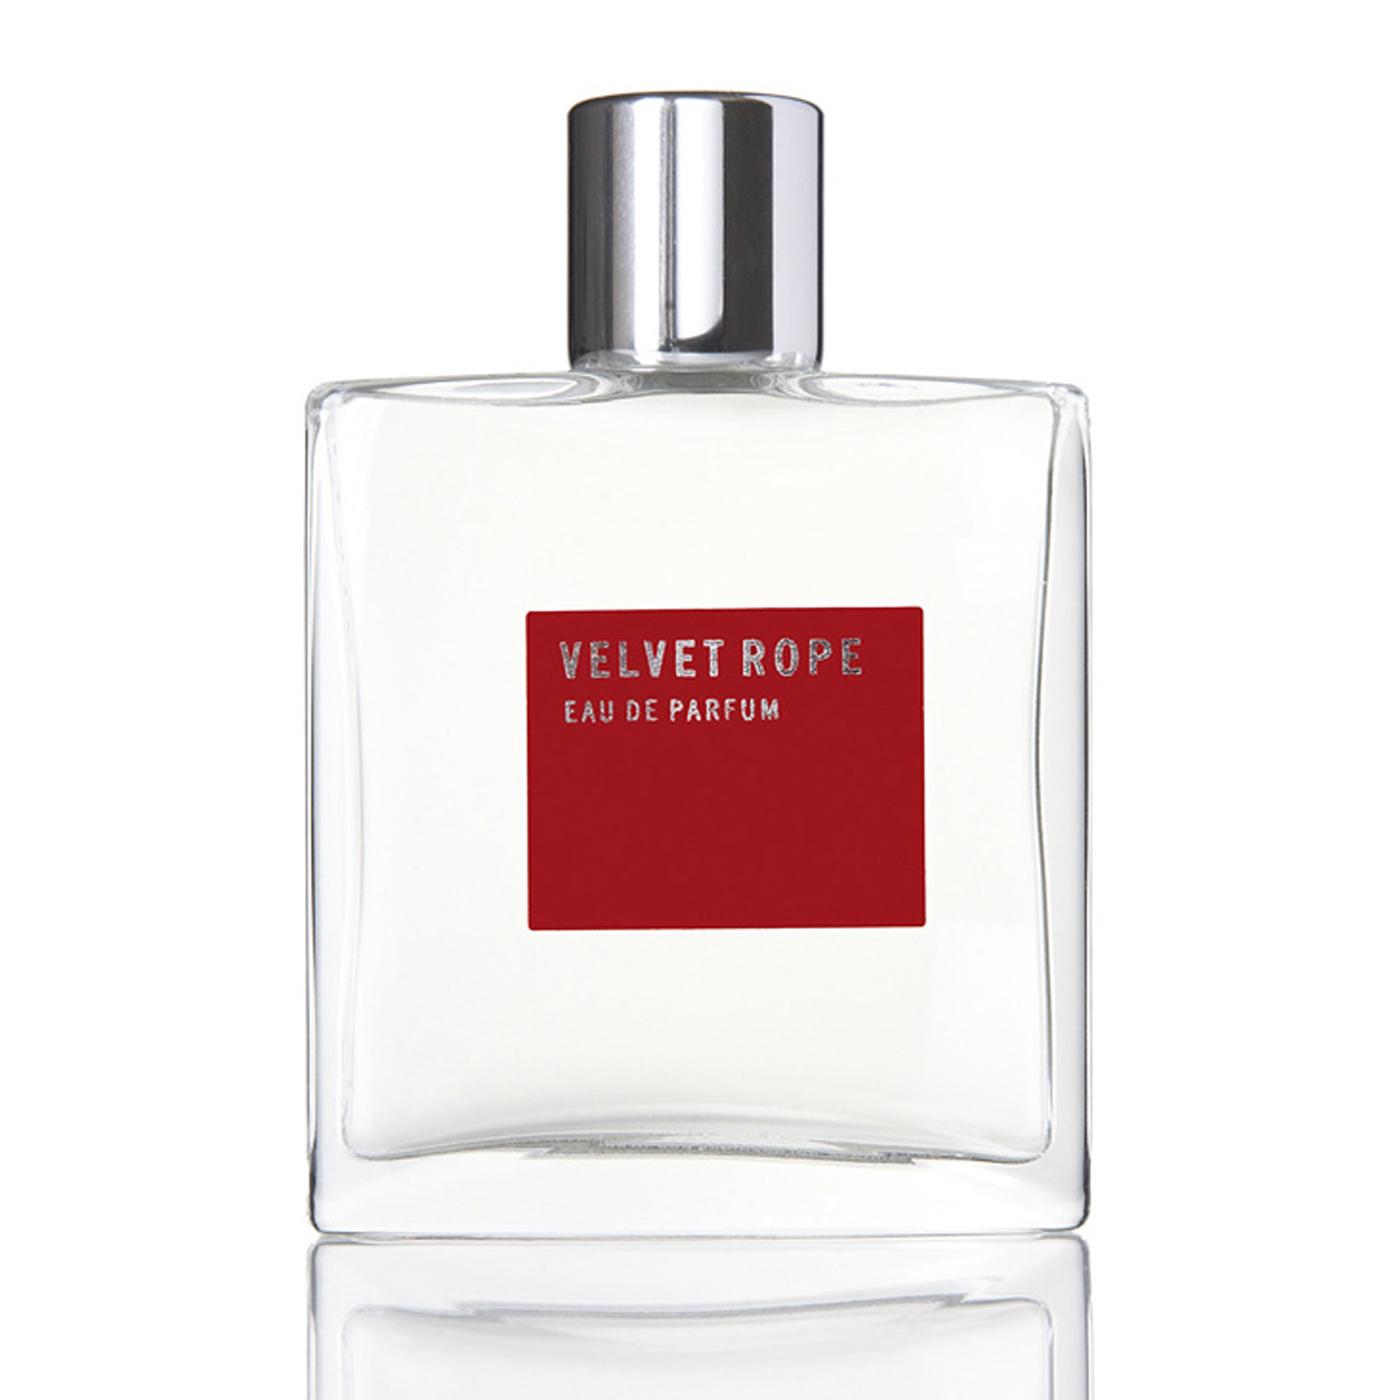 VELVET ROPE by APOTHIA 5ml Travel Spray Grapefruit Rose Cypress Vanilla Perfume